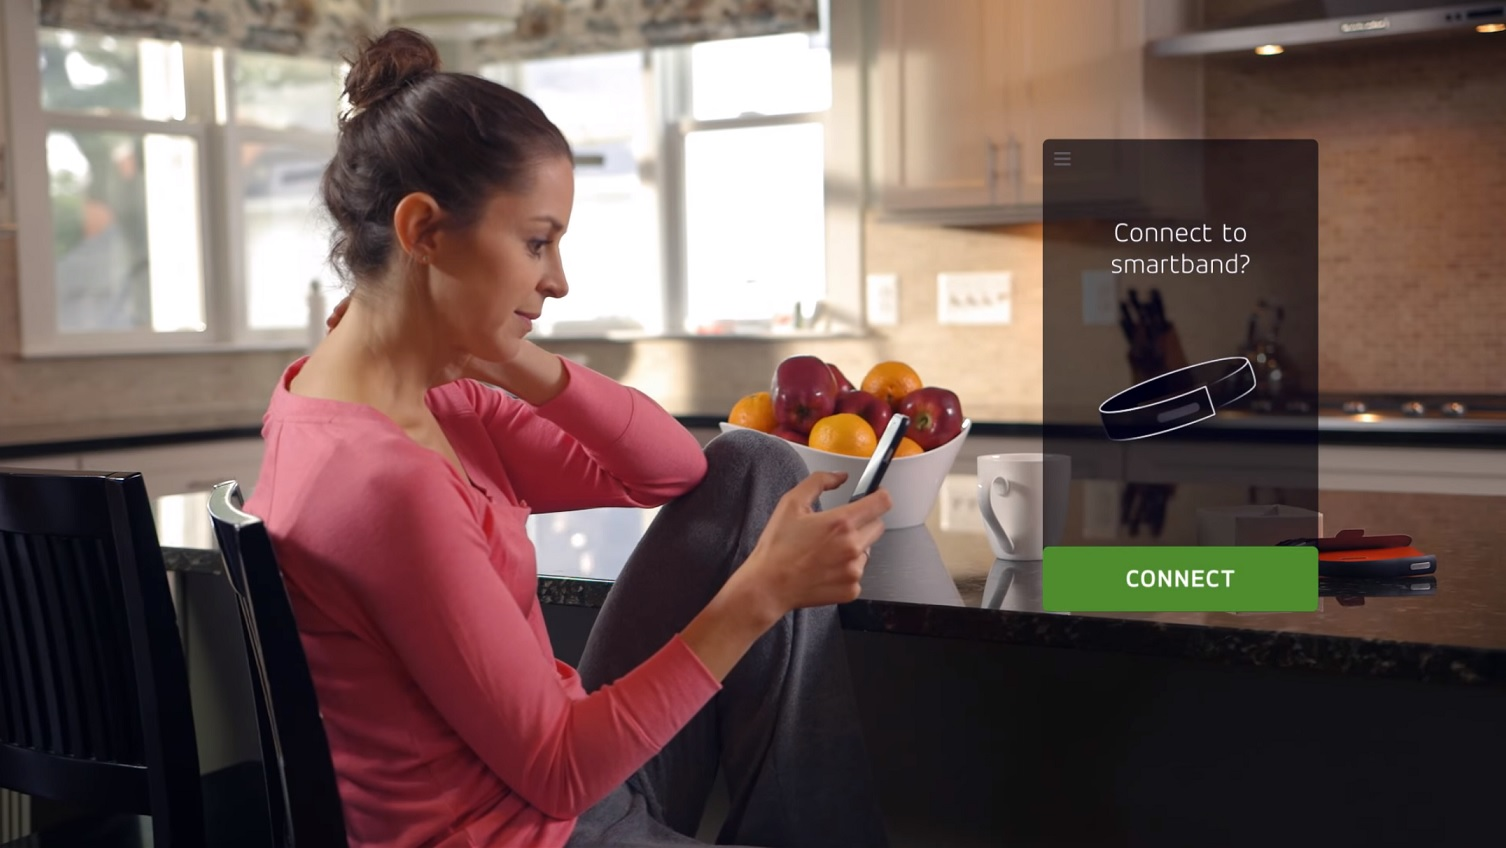 MasterCard smartband